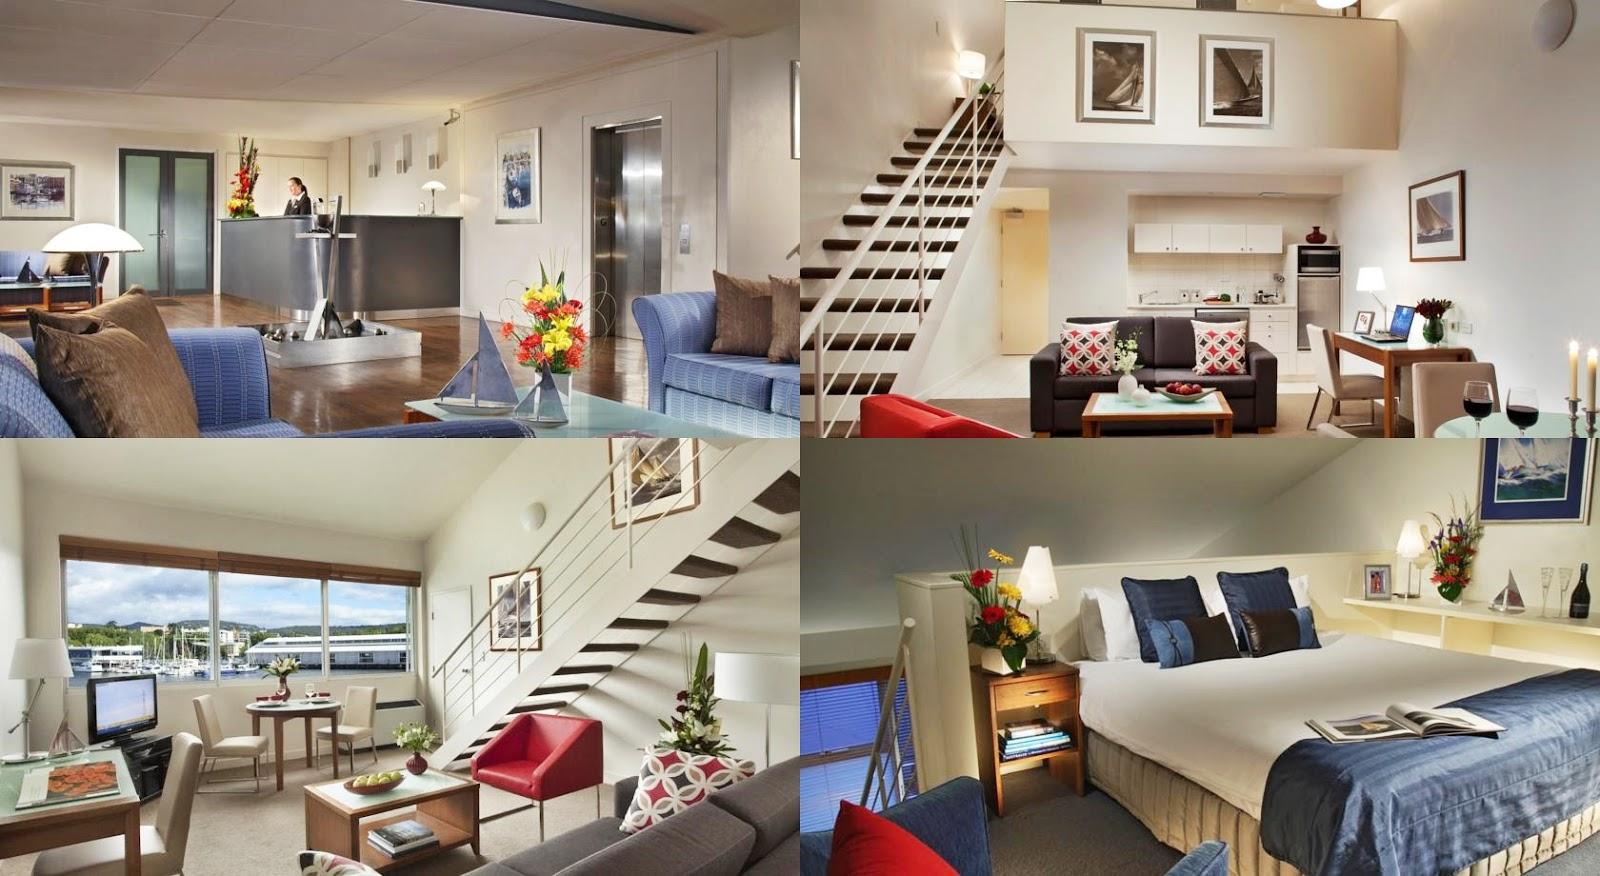 塔斯馬尼亞-住宿-推薦-皮爾薩默塞特酒店-Somerset-on-the-Pier-Hobart-塔斯馬尼亞旅館-塔斯馬尼亞飯店-塔斯馬尼亞酒店-塔斯馬尼亞民宿-塔斯馬尼亞公寓-澳洲-Tasmania-Hotel-Apartment-Accommodation-Australia